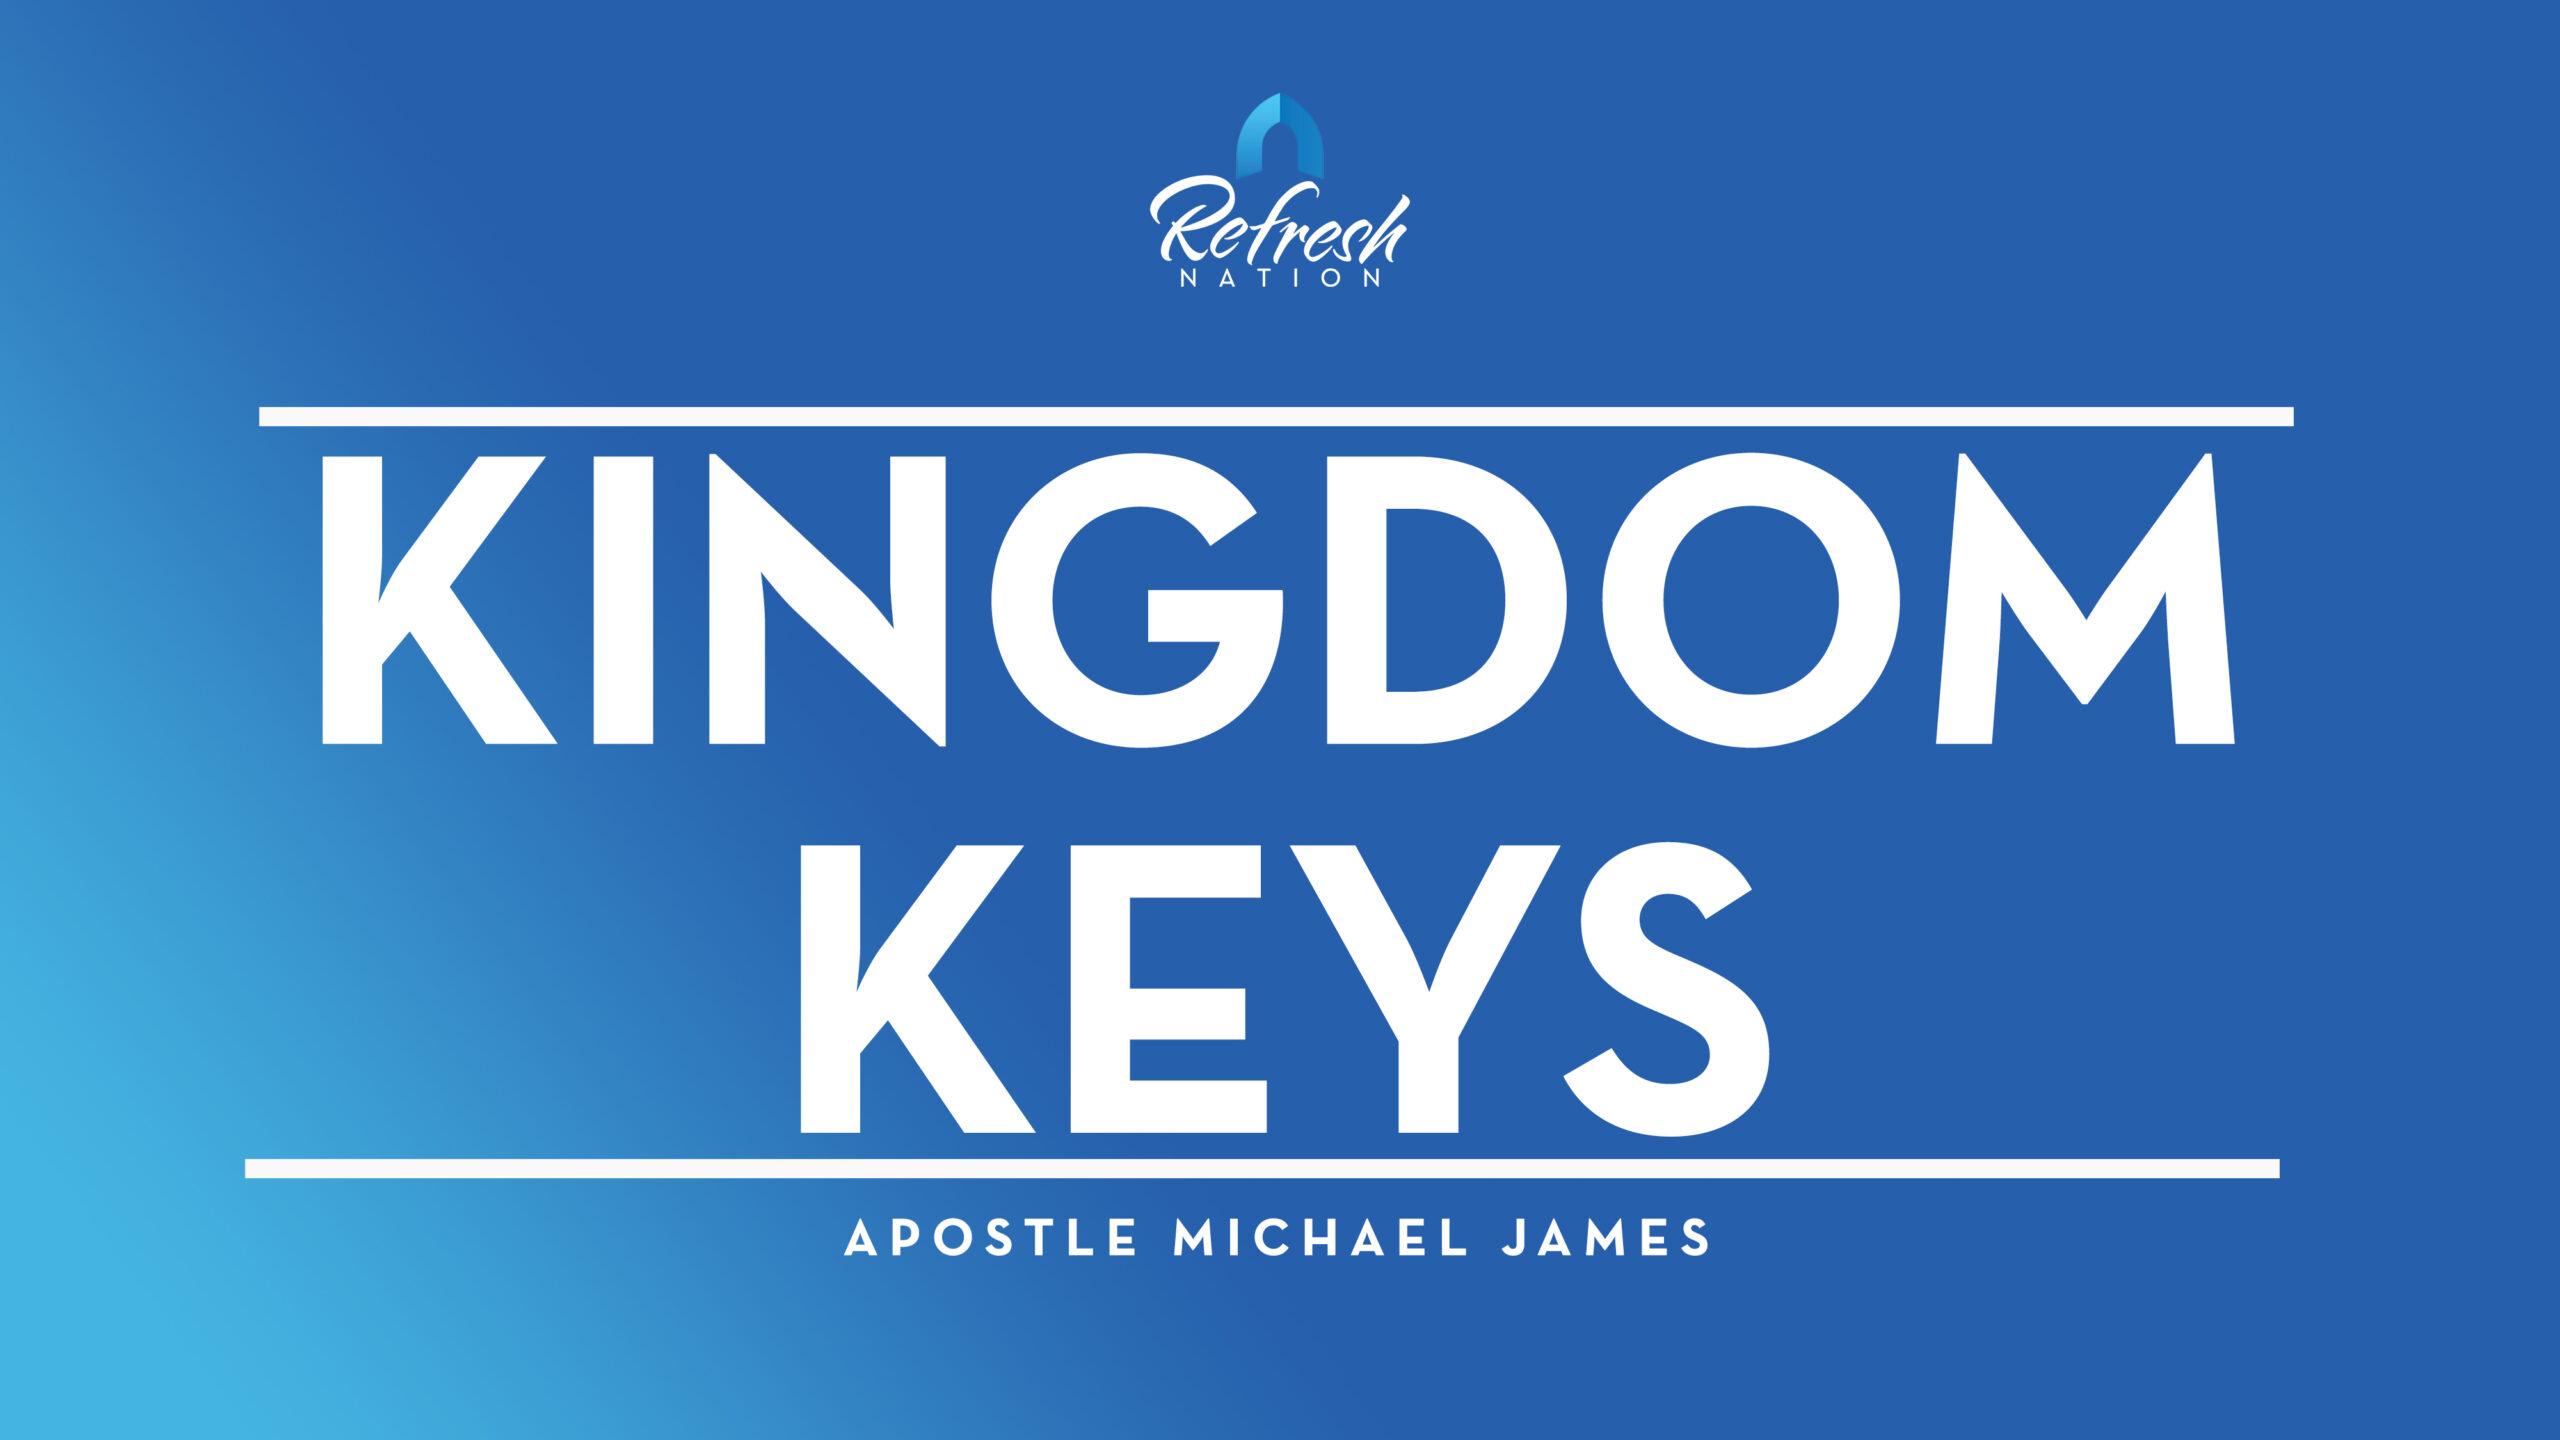 Kingdom Keys for Apostolic & Kingdom Advancement – Apostle Michael James